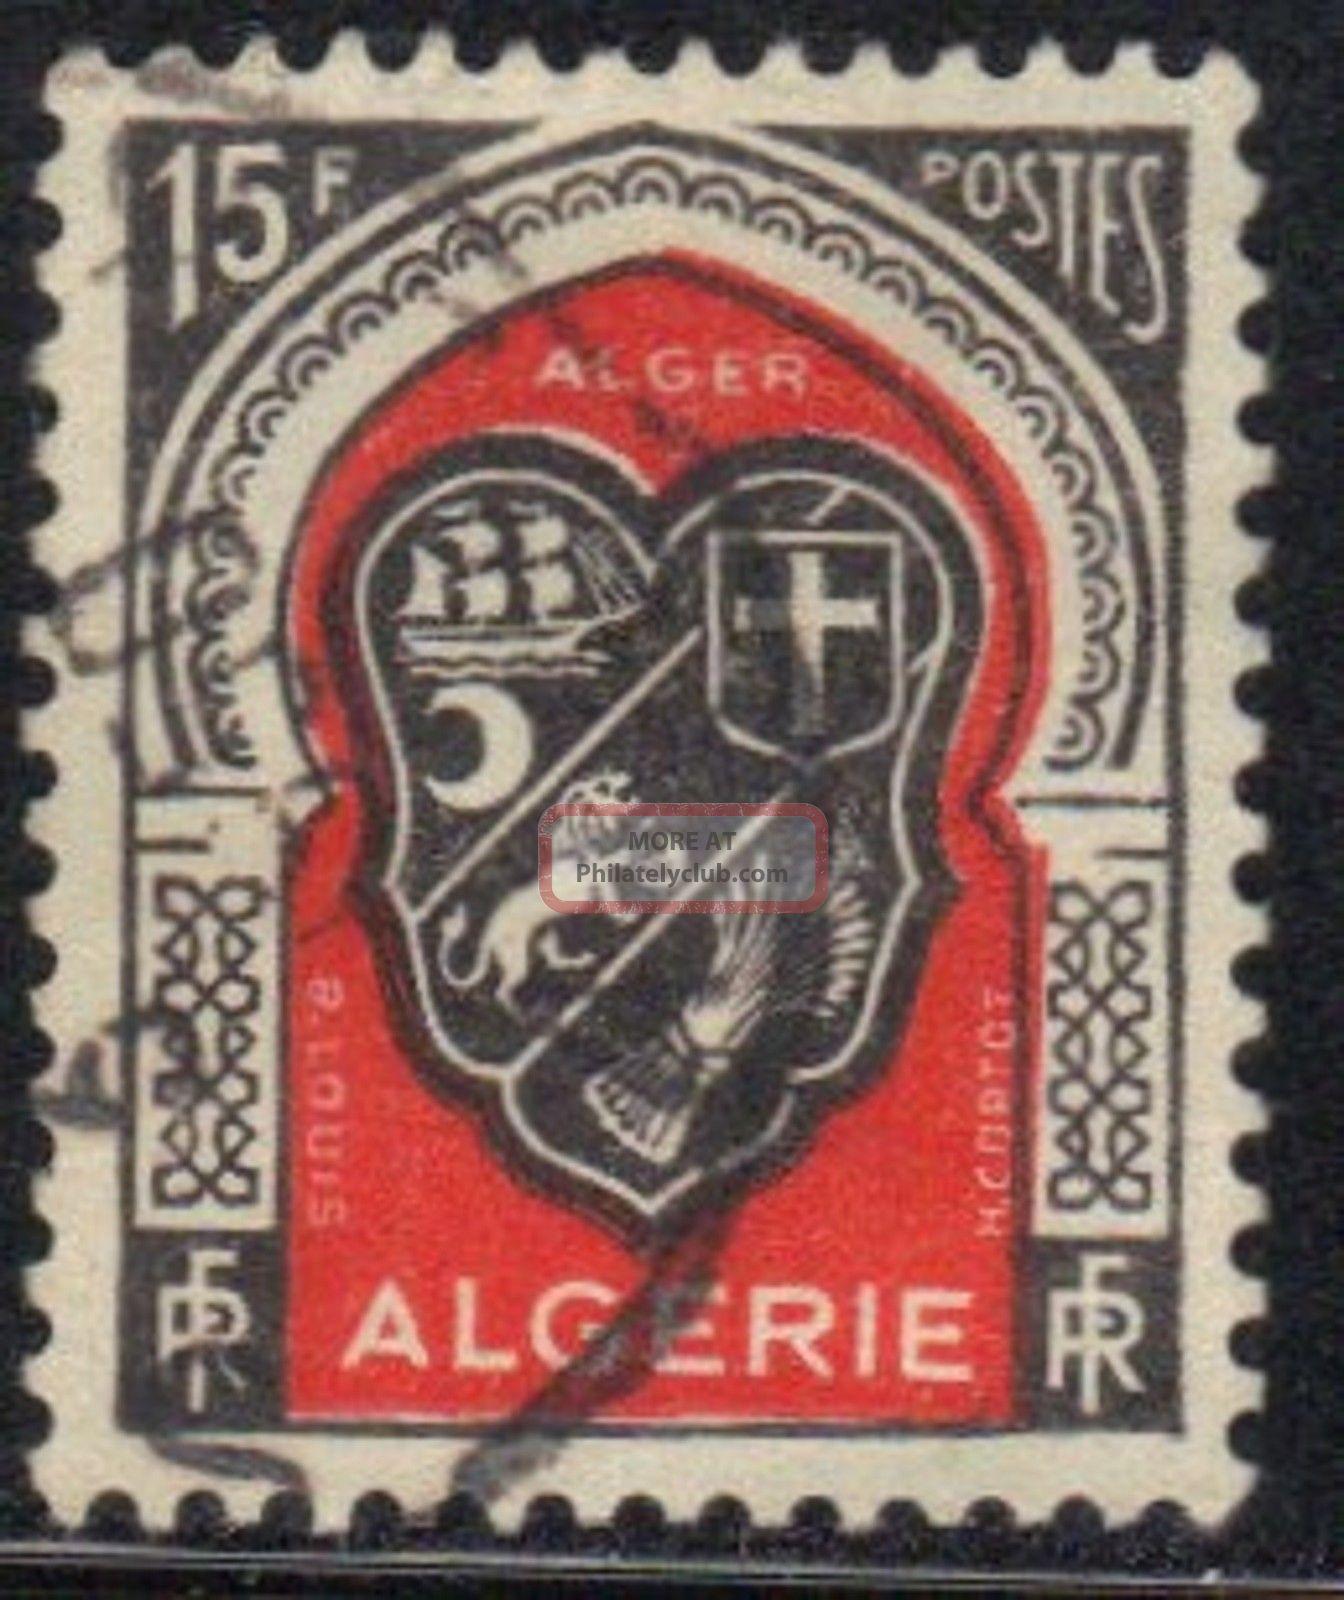 Algeria Stamp Scott 225 Stamp See Photo Africa photo